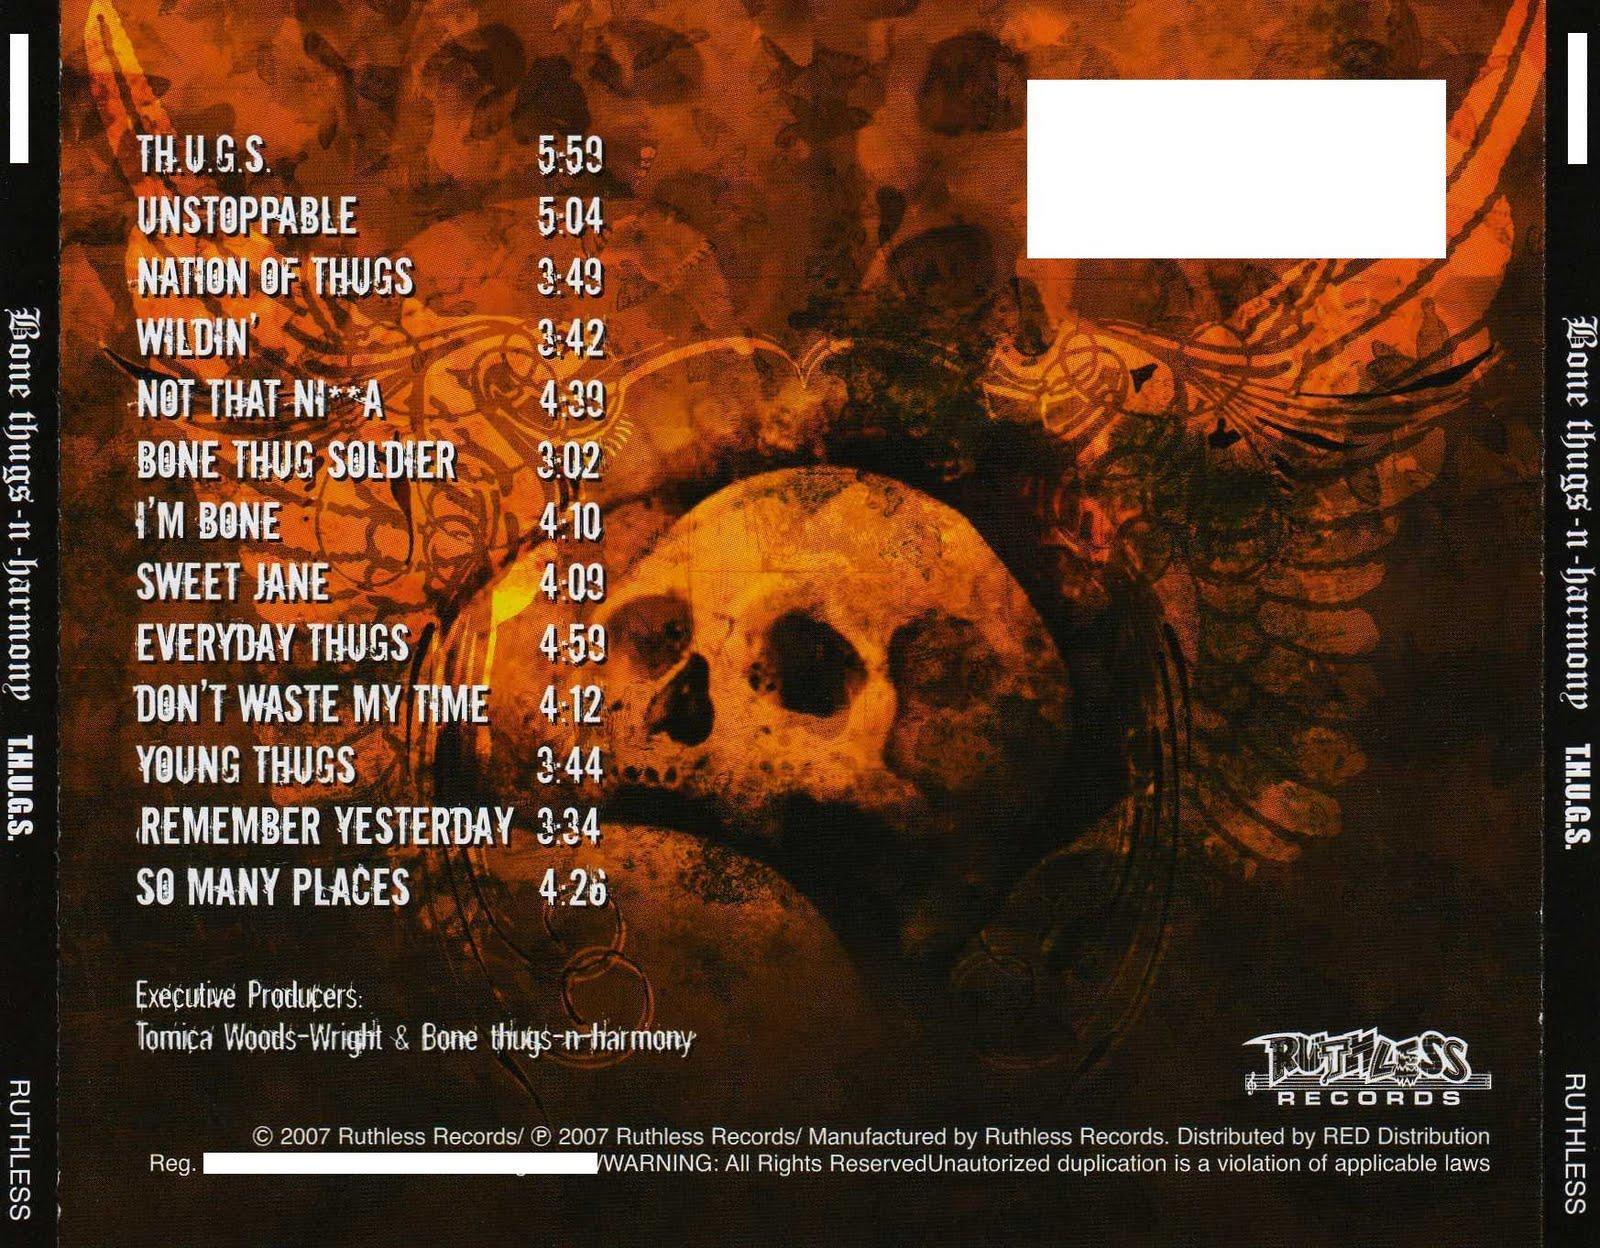 Bone Thugs N Harmony Wallpaper elrinconcitodemaya 1600x1248